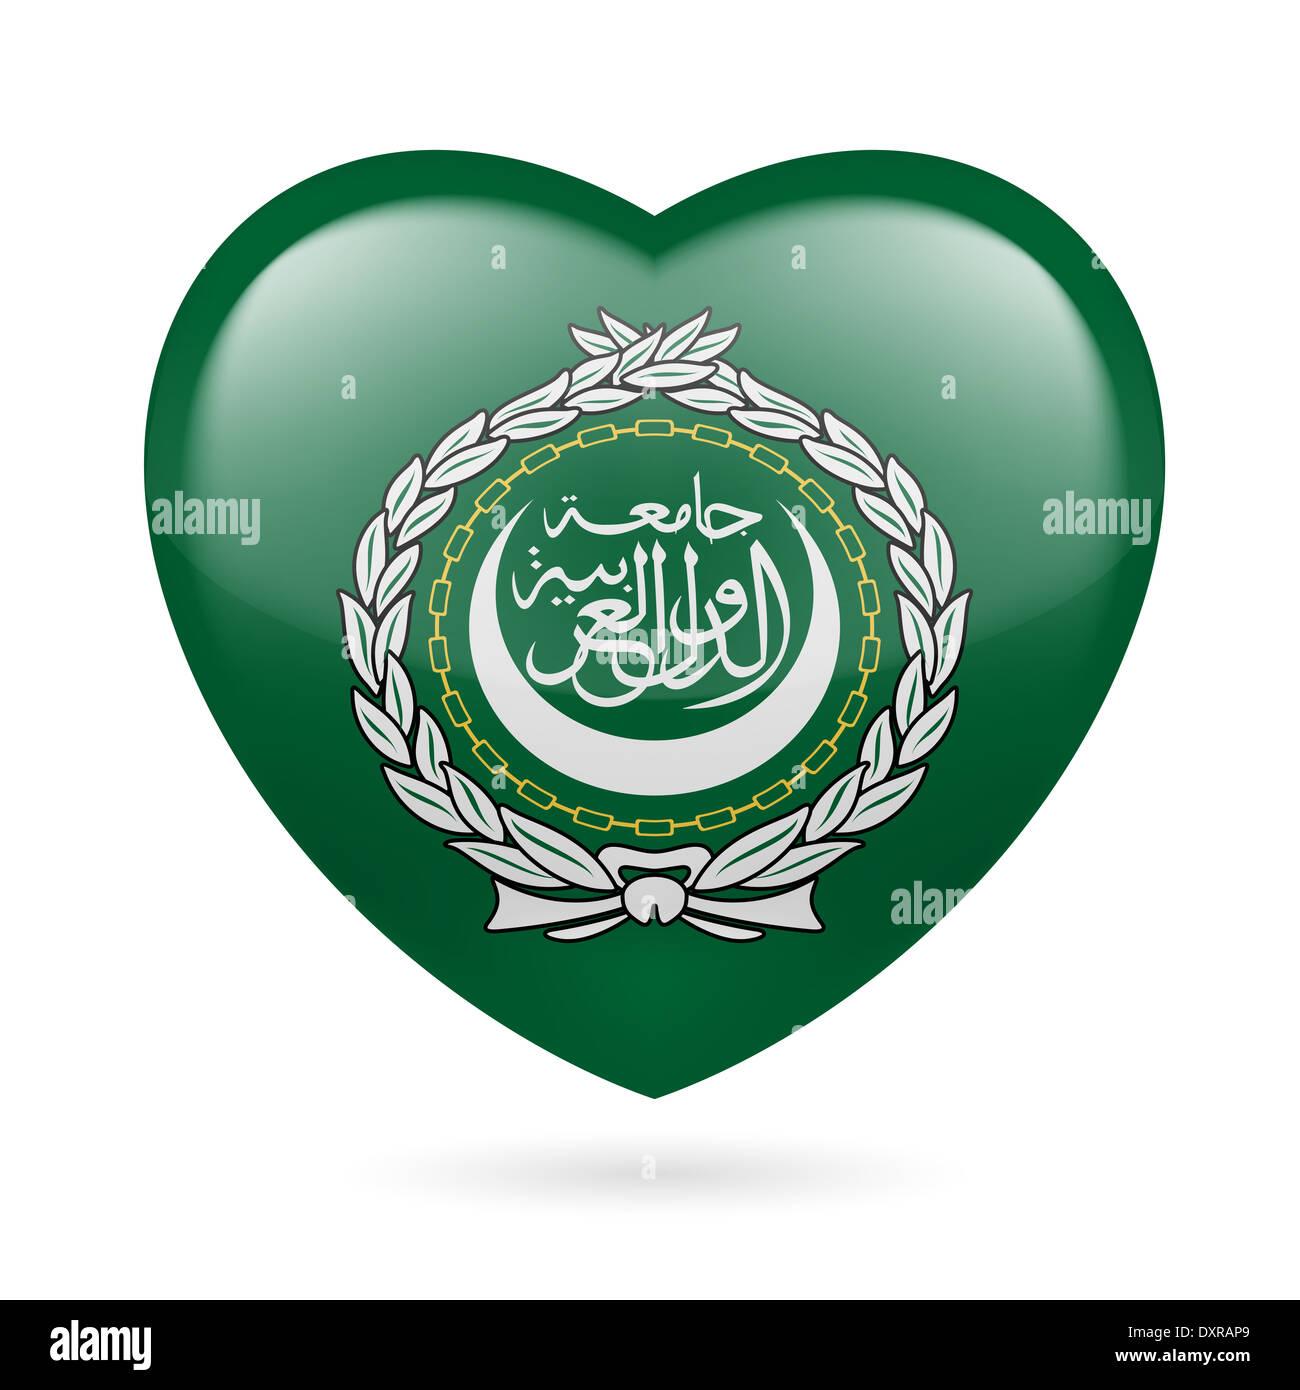 I love Arab League. Heart with flag design - Stock Image